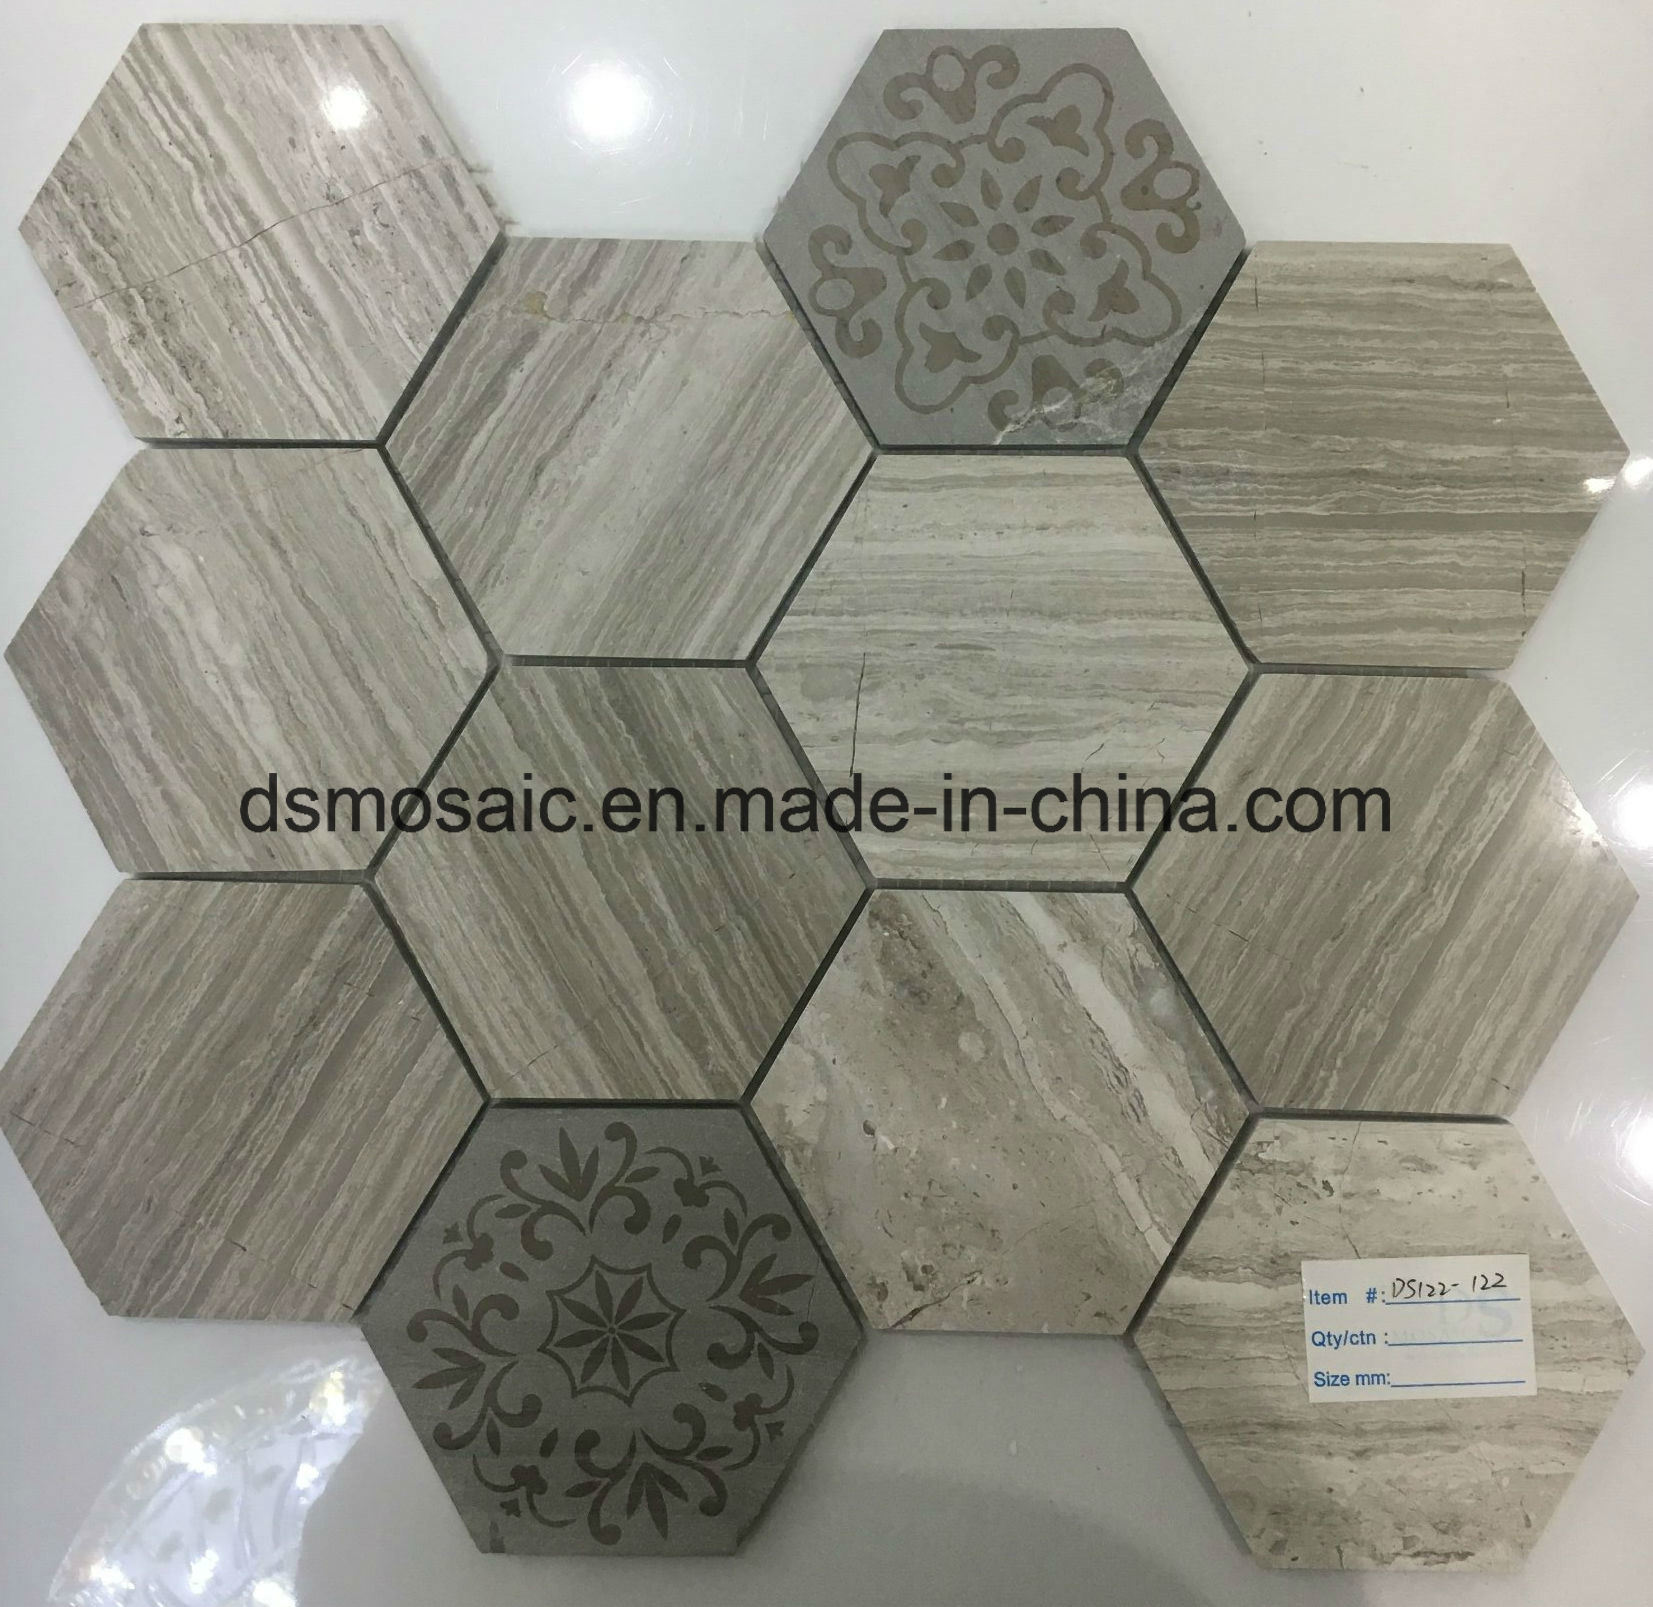 Wooden Grain Grey Hexagon Marble Mosaic Tile